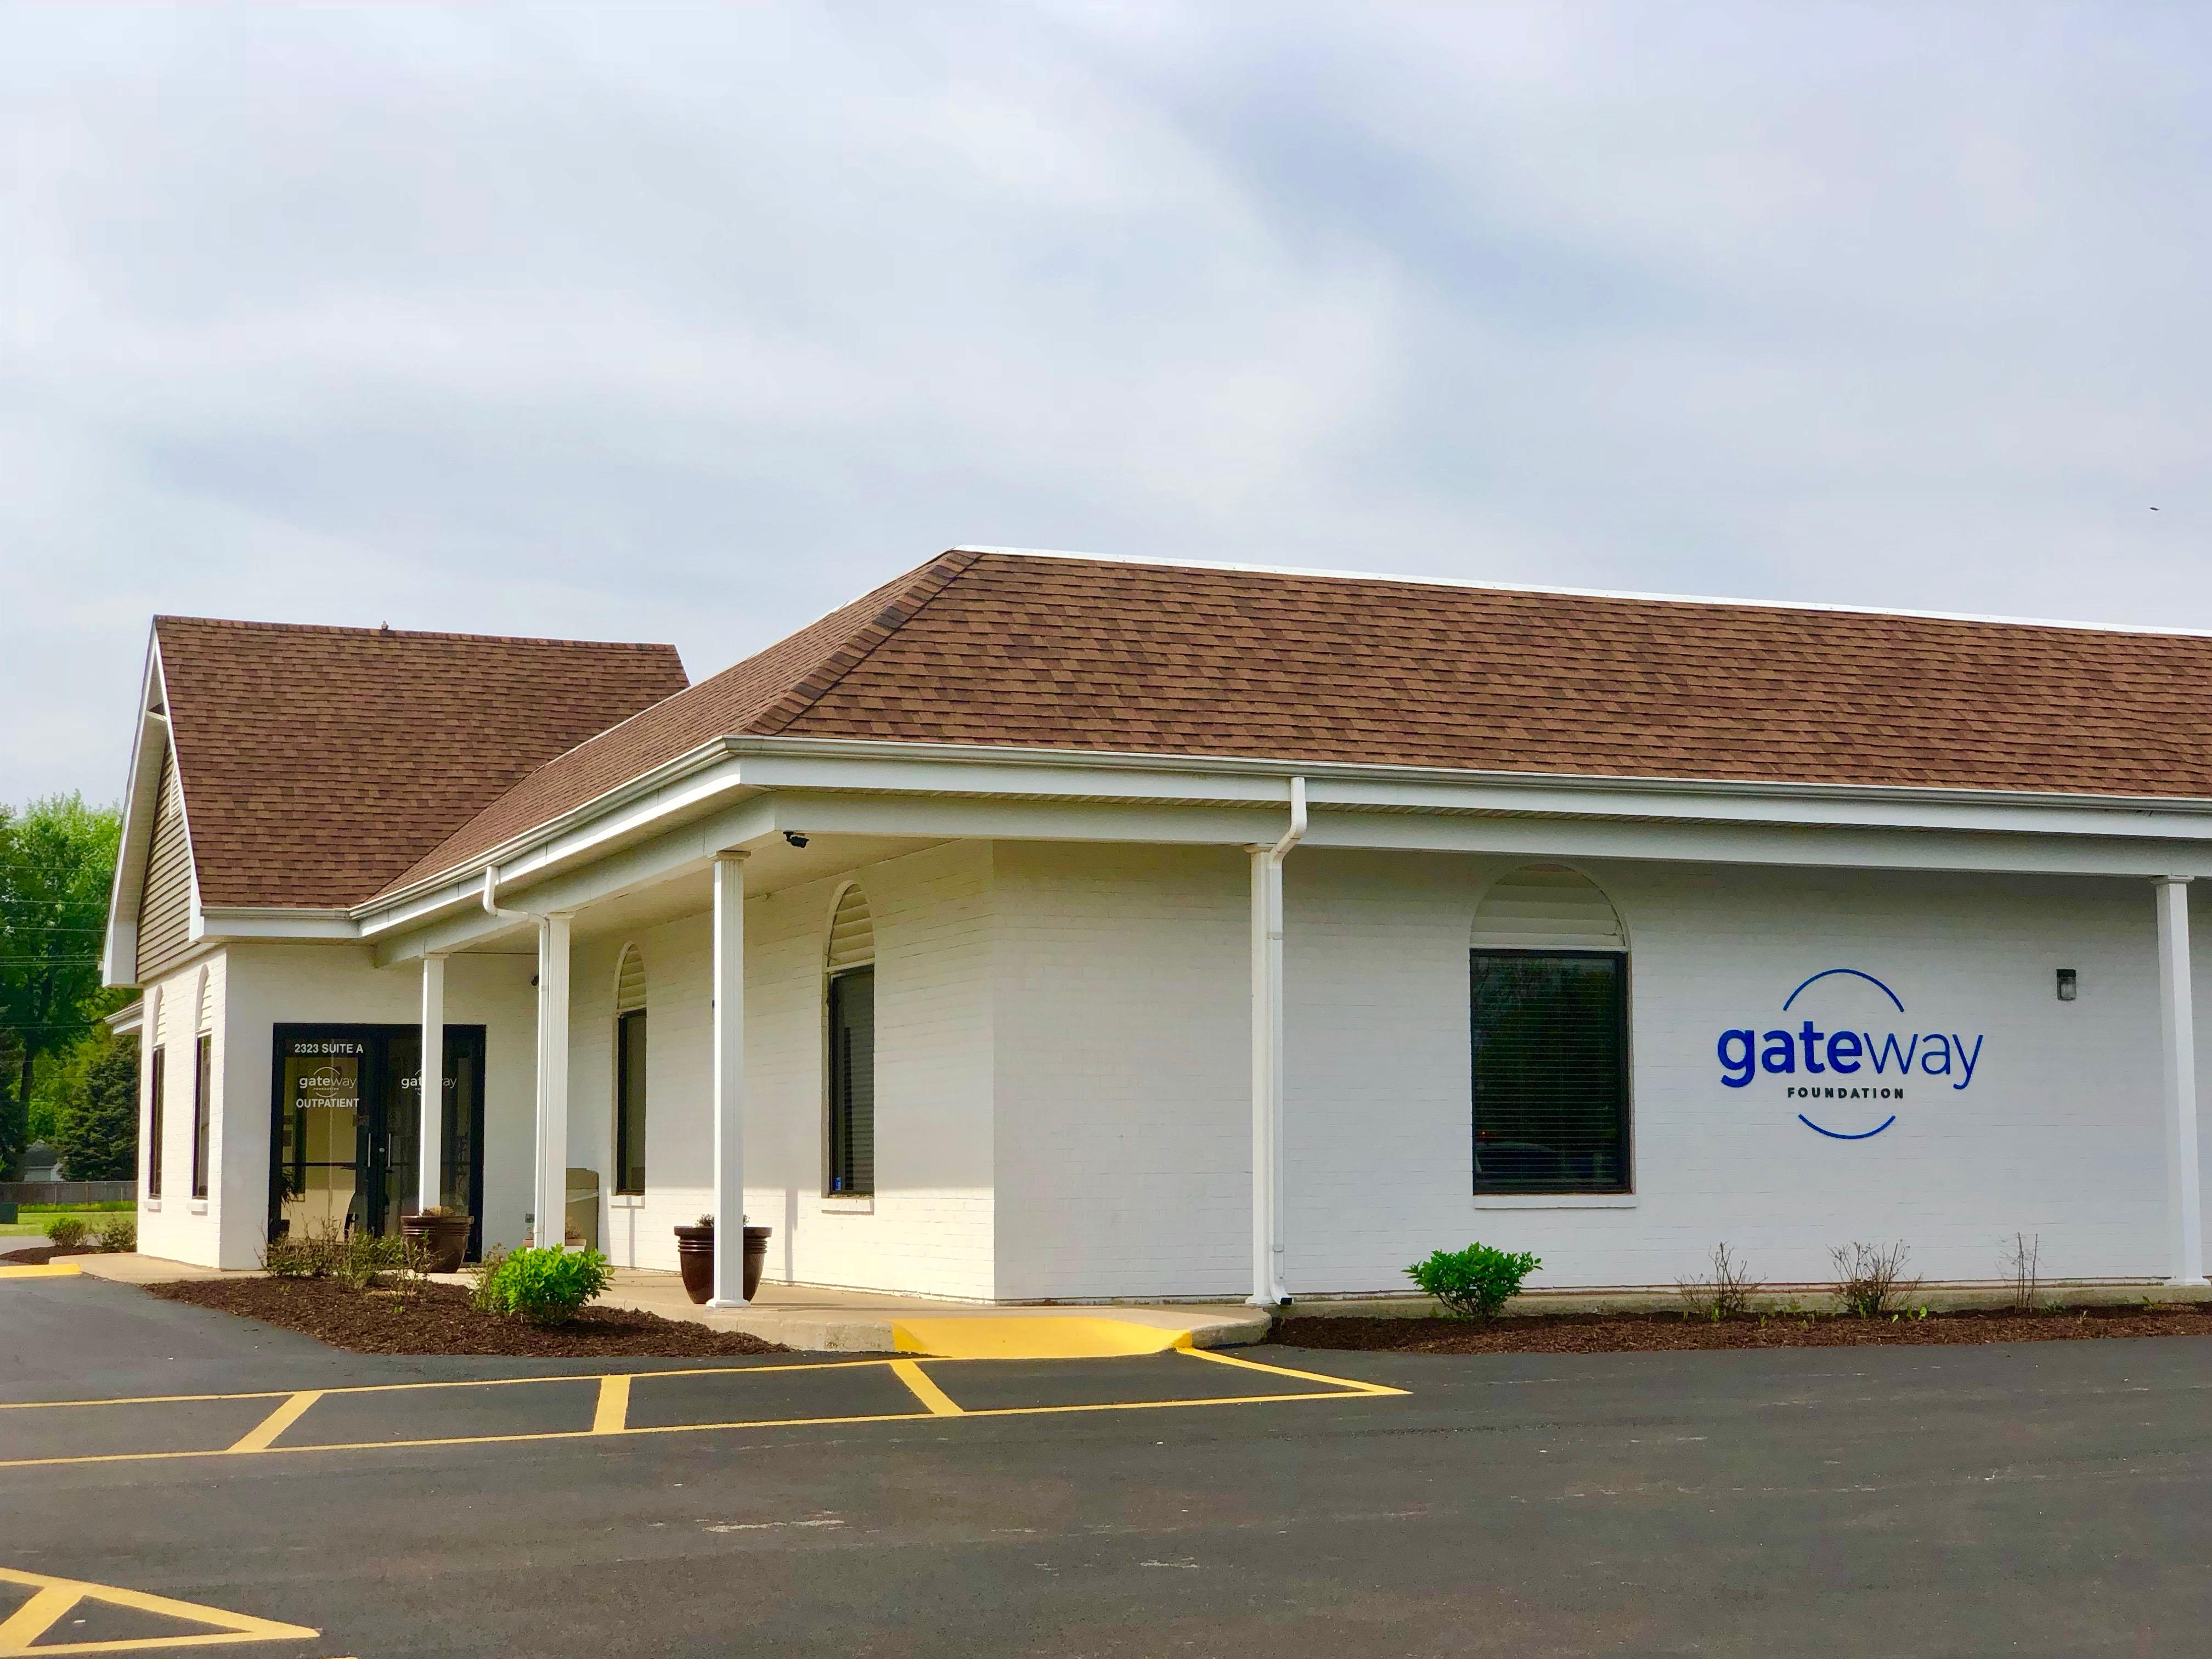 Gateway Foundation Alcohol & Drug Treatment Centers - Springfield Outpatient image 1